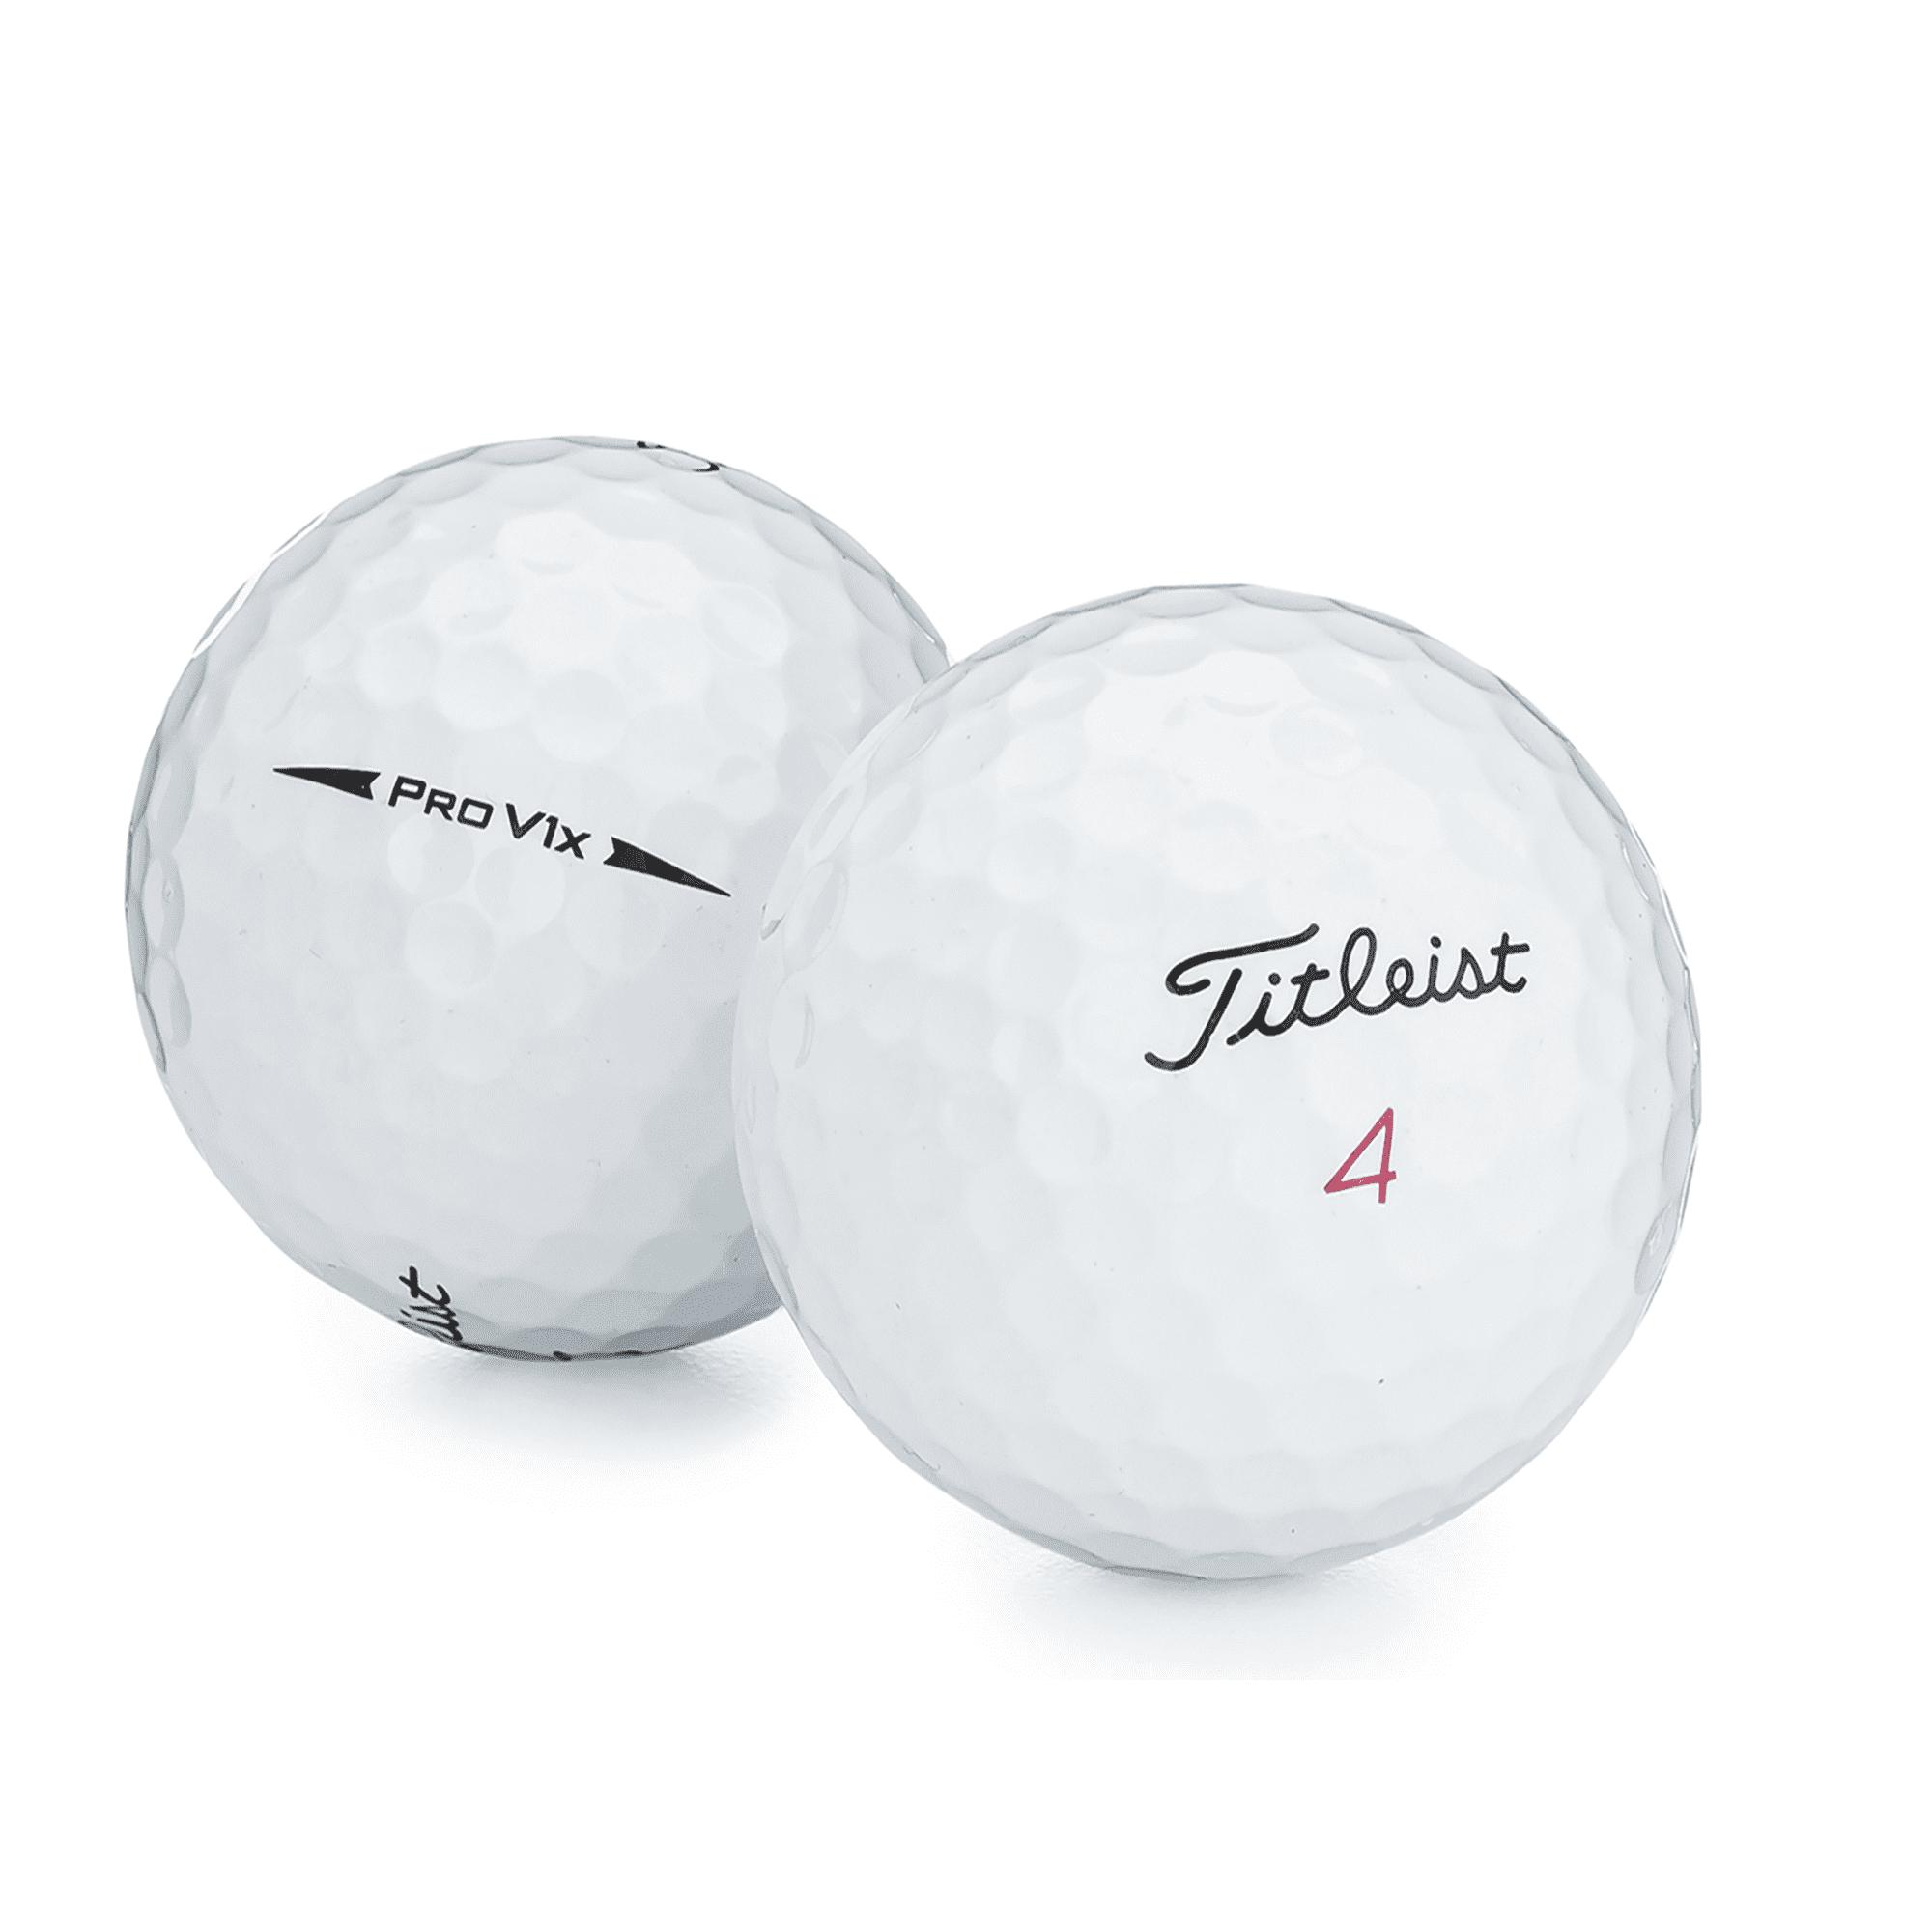 Titleist Pro V1x - Mint Quality - 24 Golf Balls